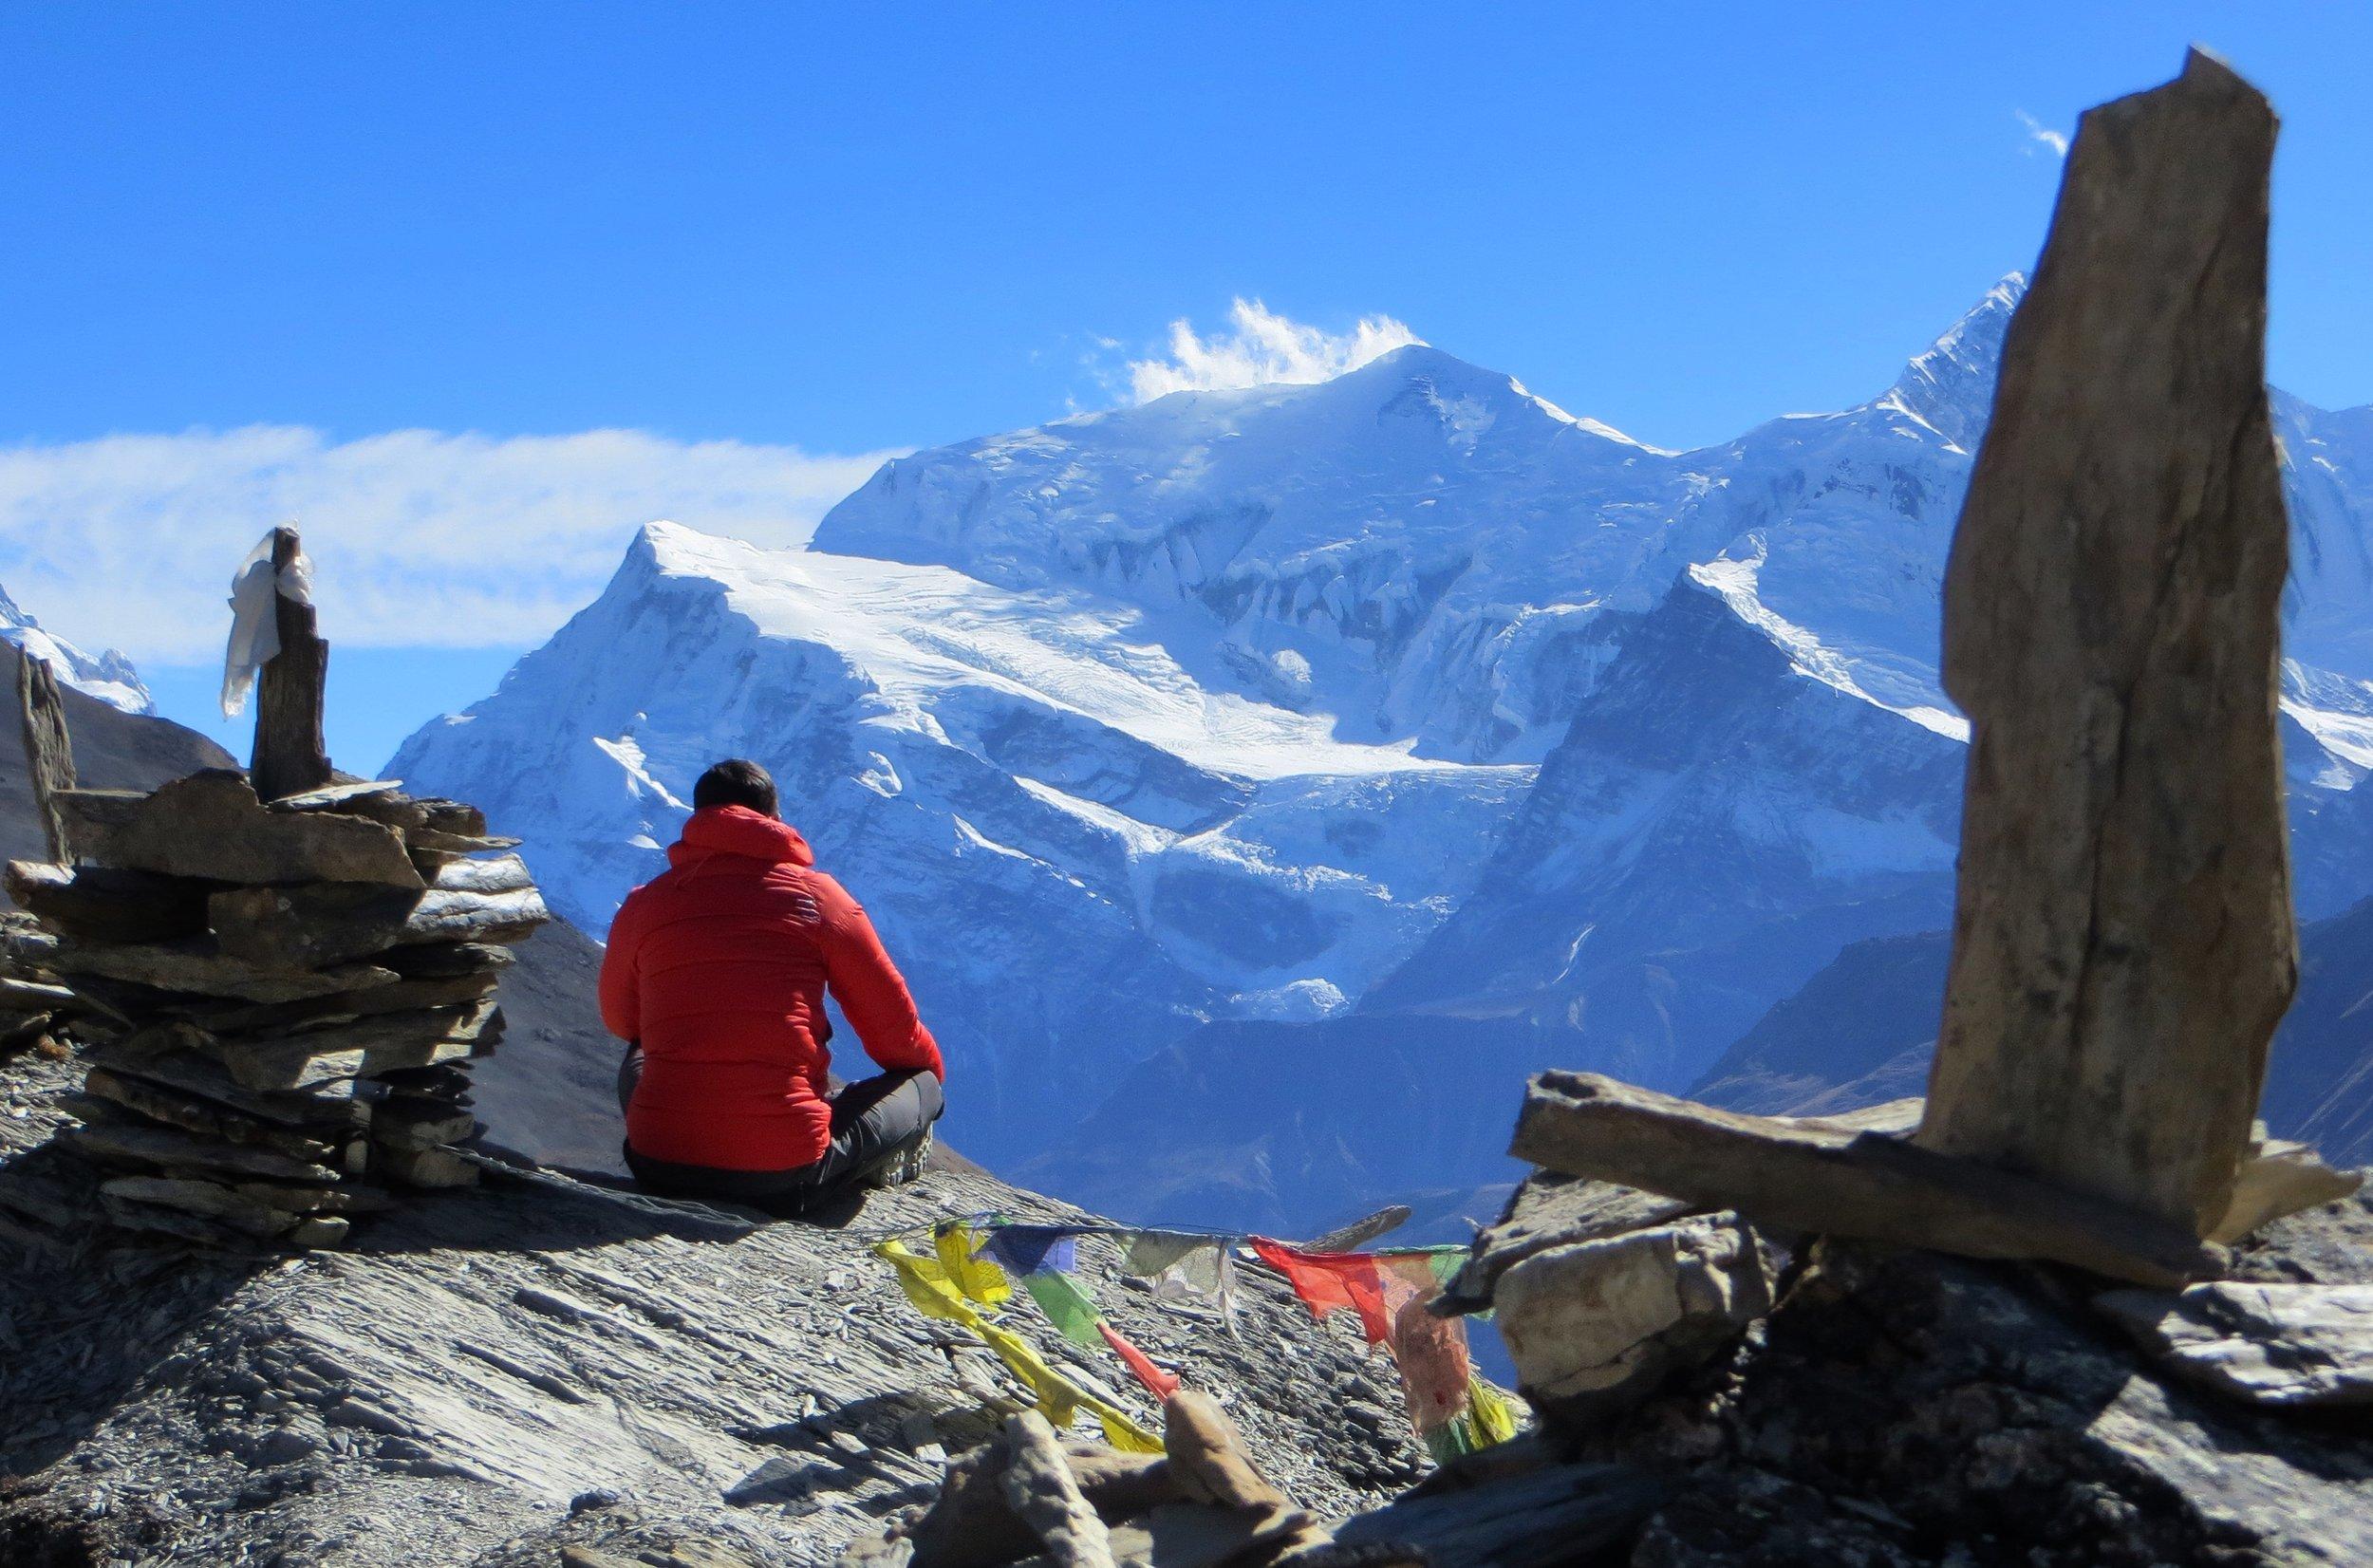 Annapurna, Nepal. 4900m. 2016